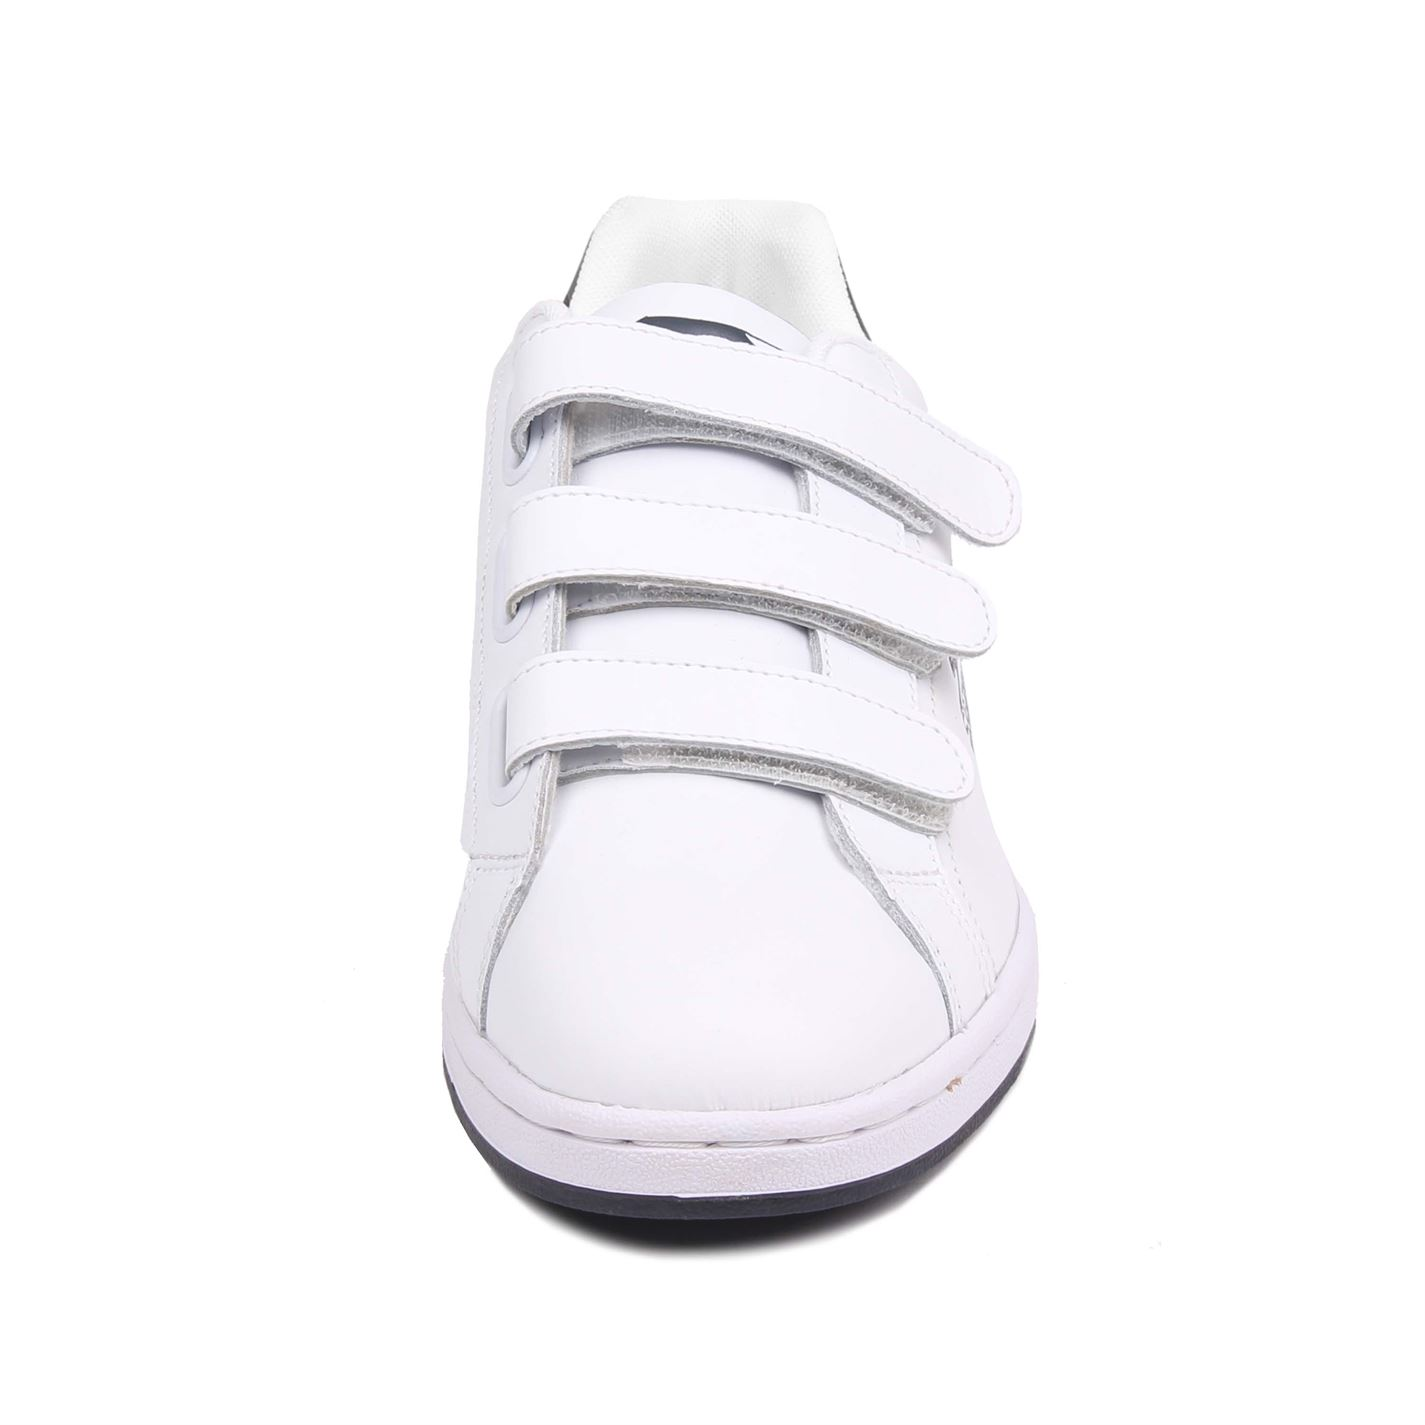 6637b6959e671 Slazenger Mens Ash Vel Fashion Hook And Loop Casual Shoes Trainers ...